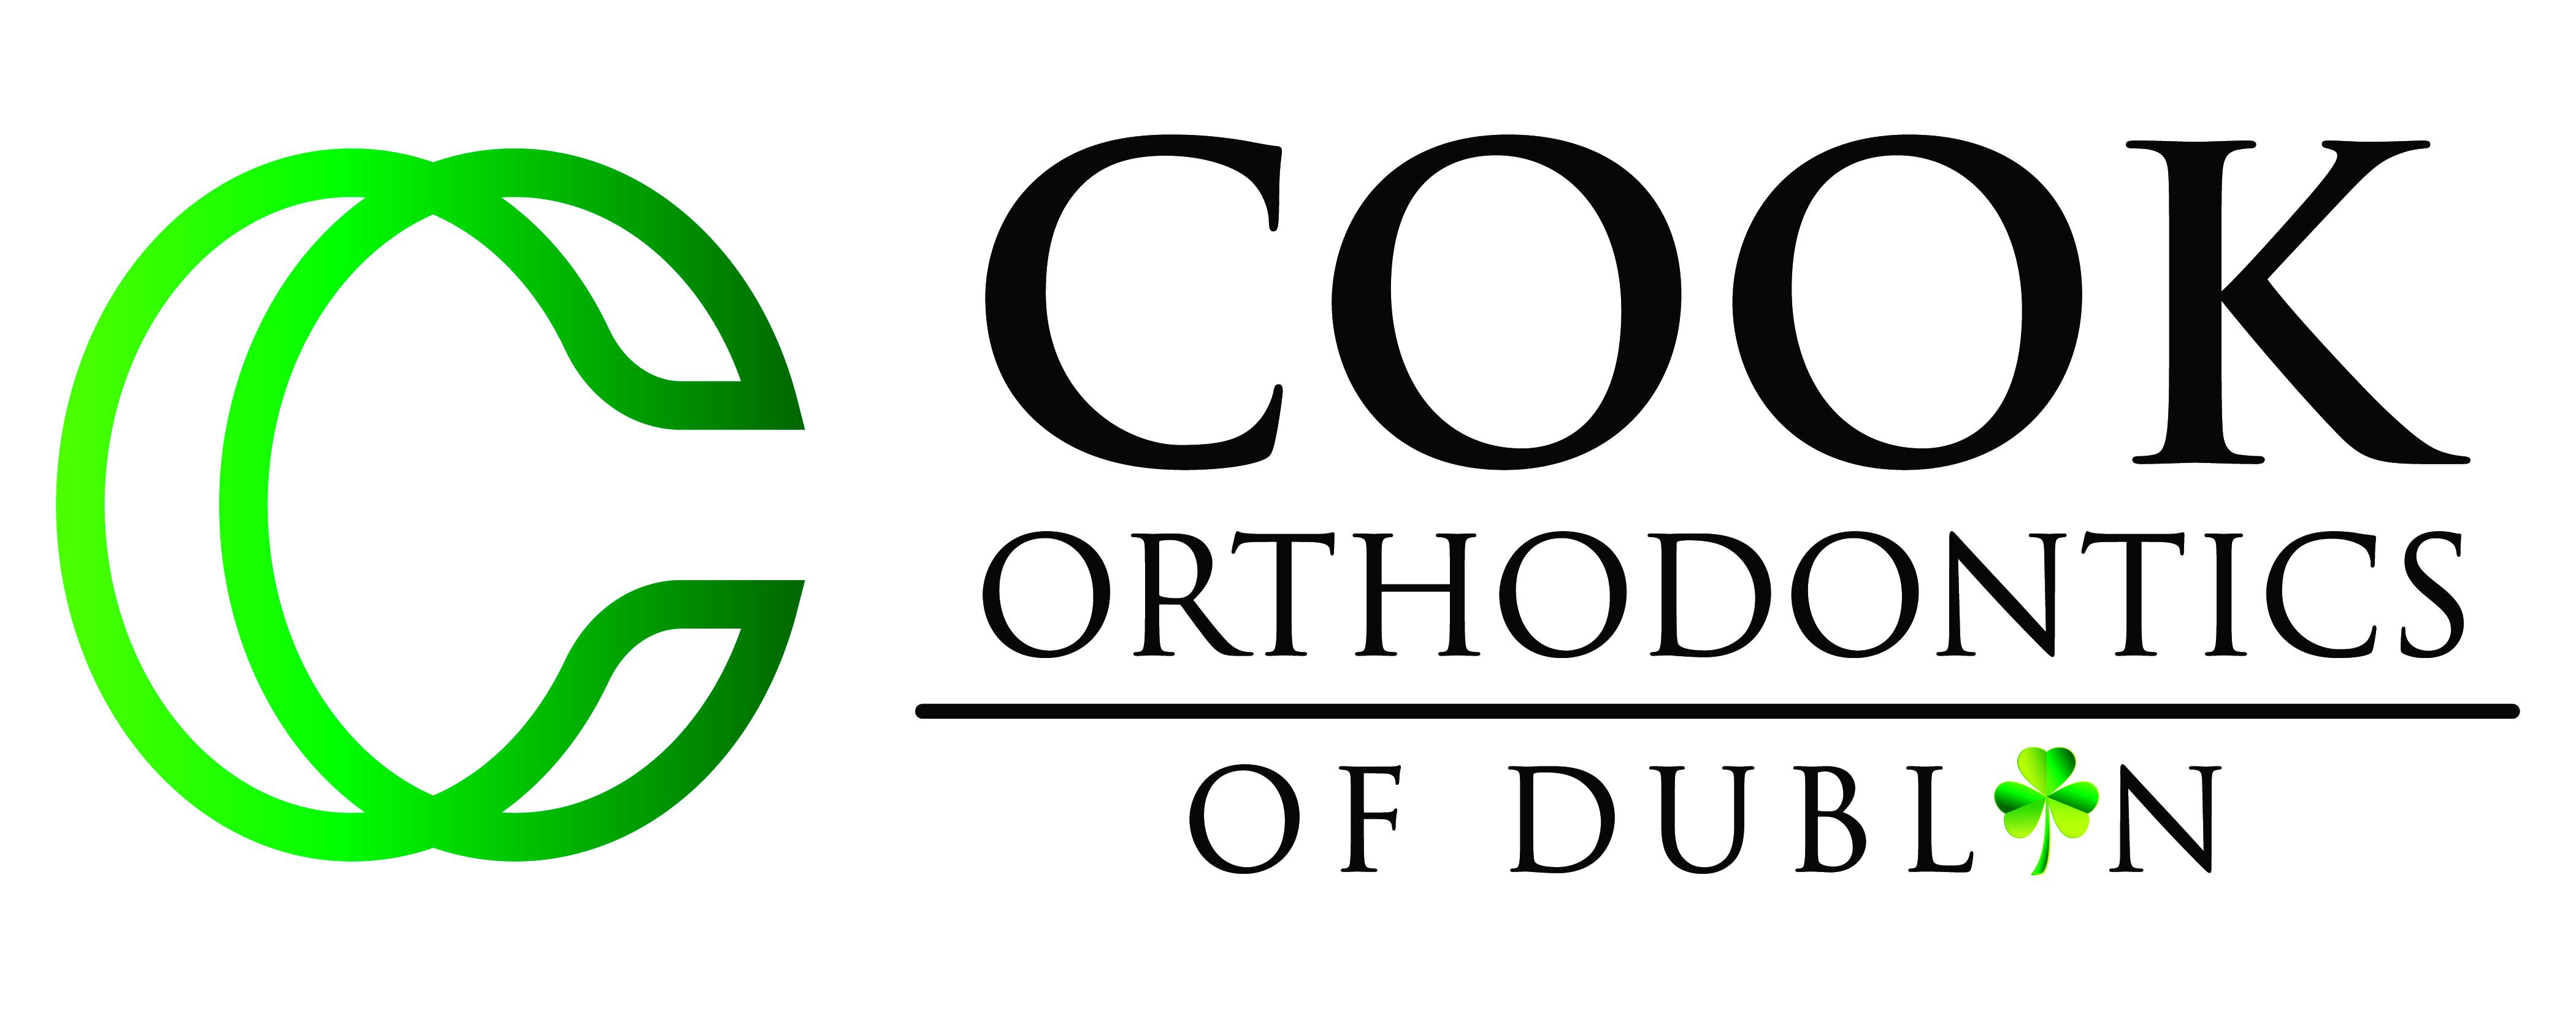 Cook Orthodontics of Dublin